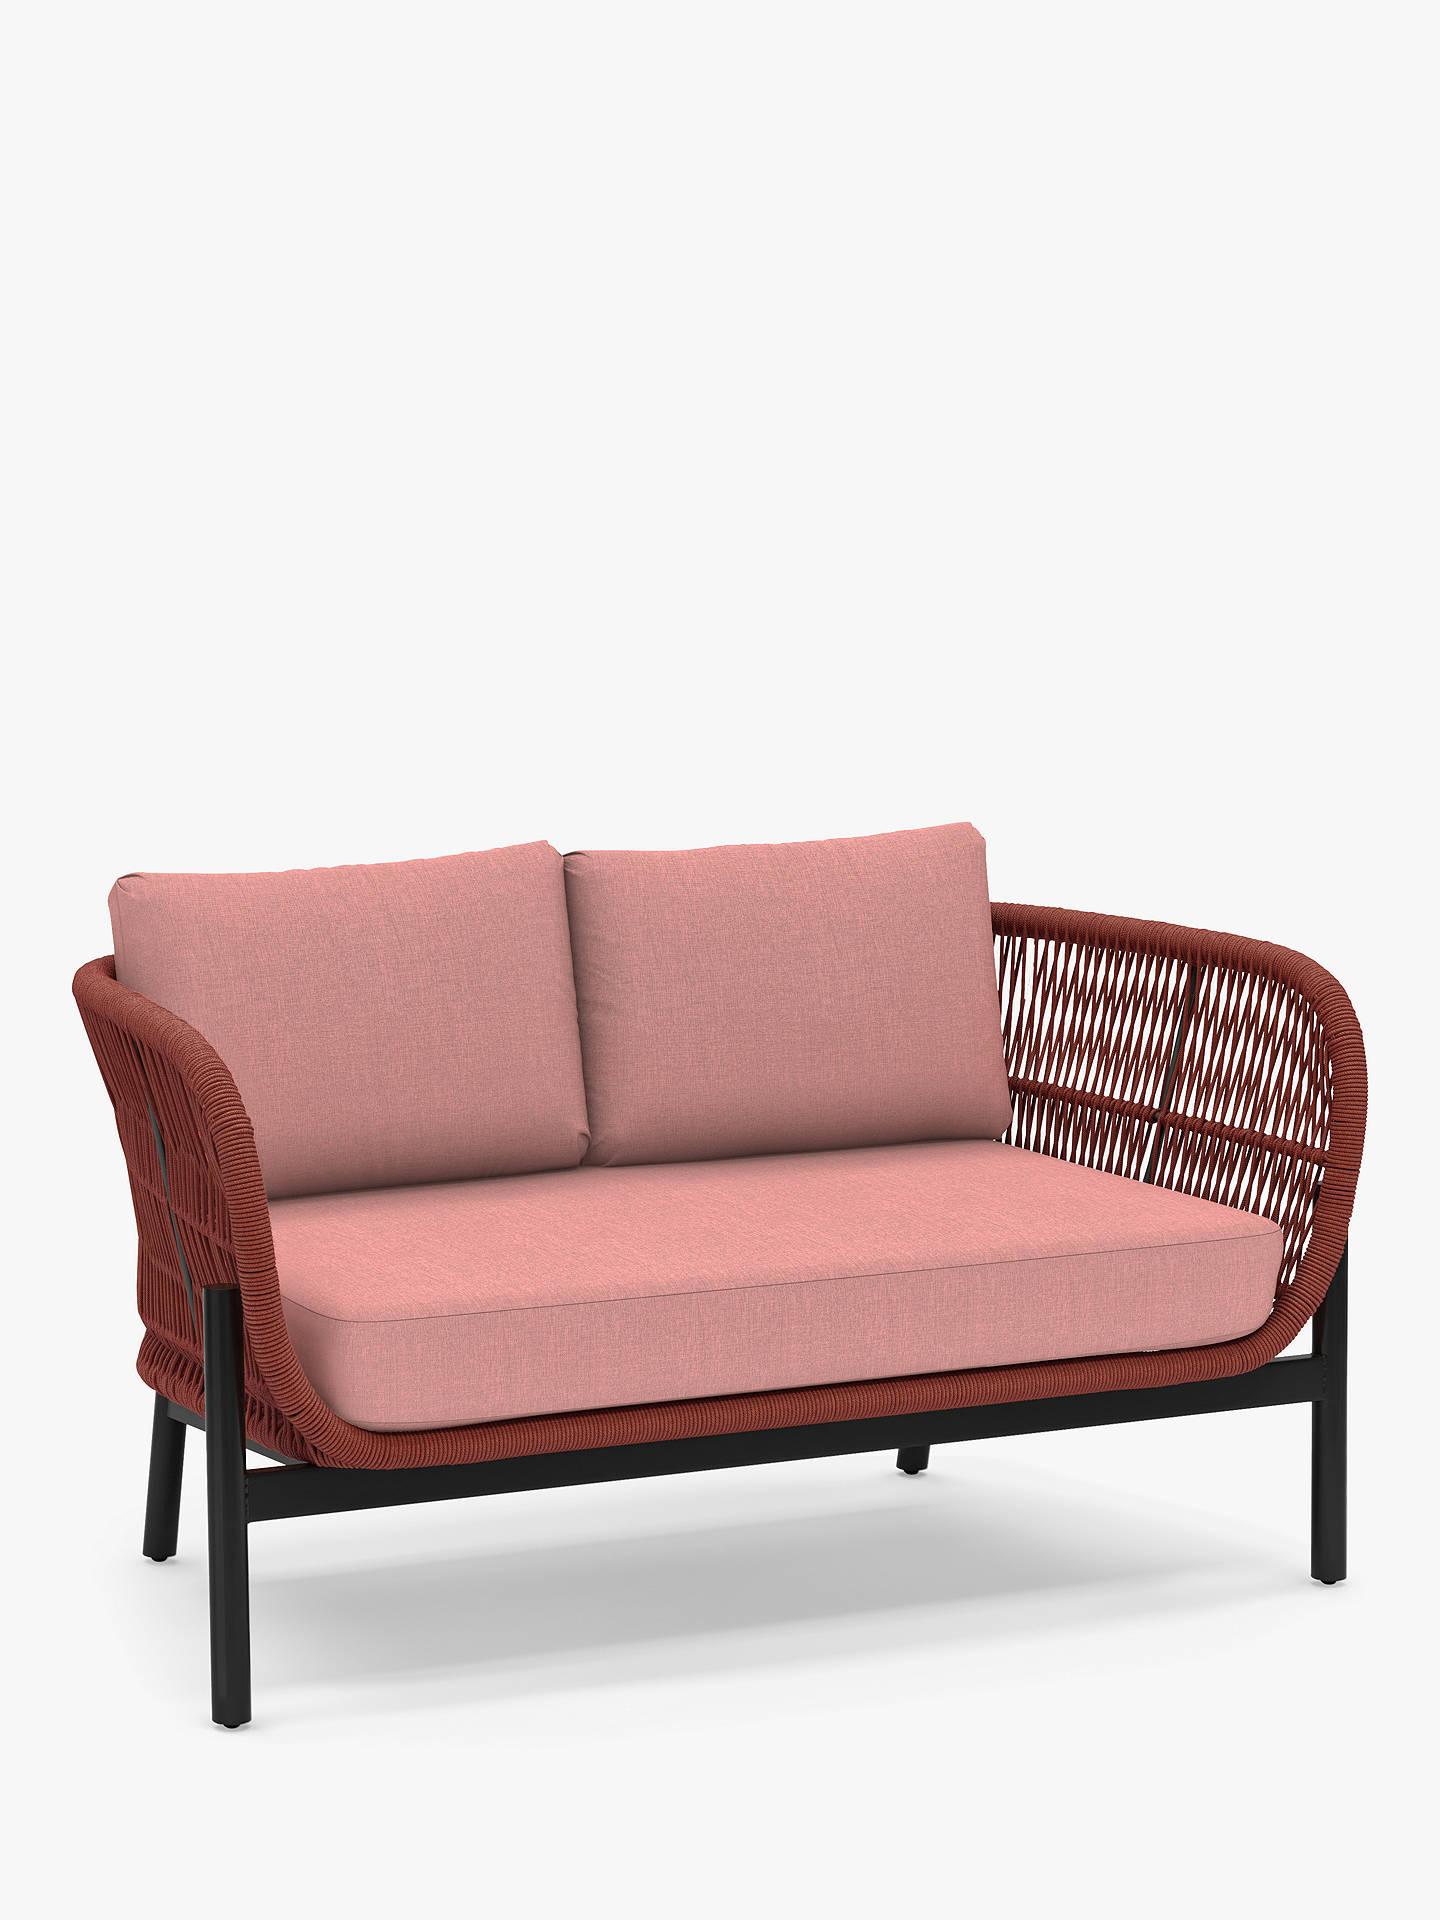 John Lewis & Partners Basket Rope 8-Seat Garden Sofa, Terracotta